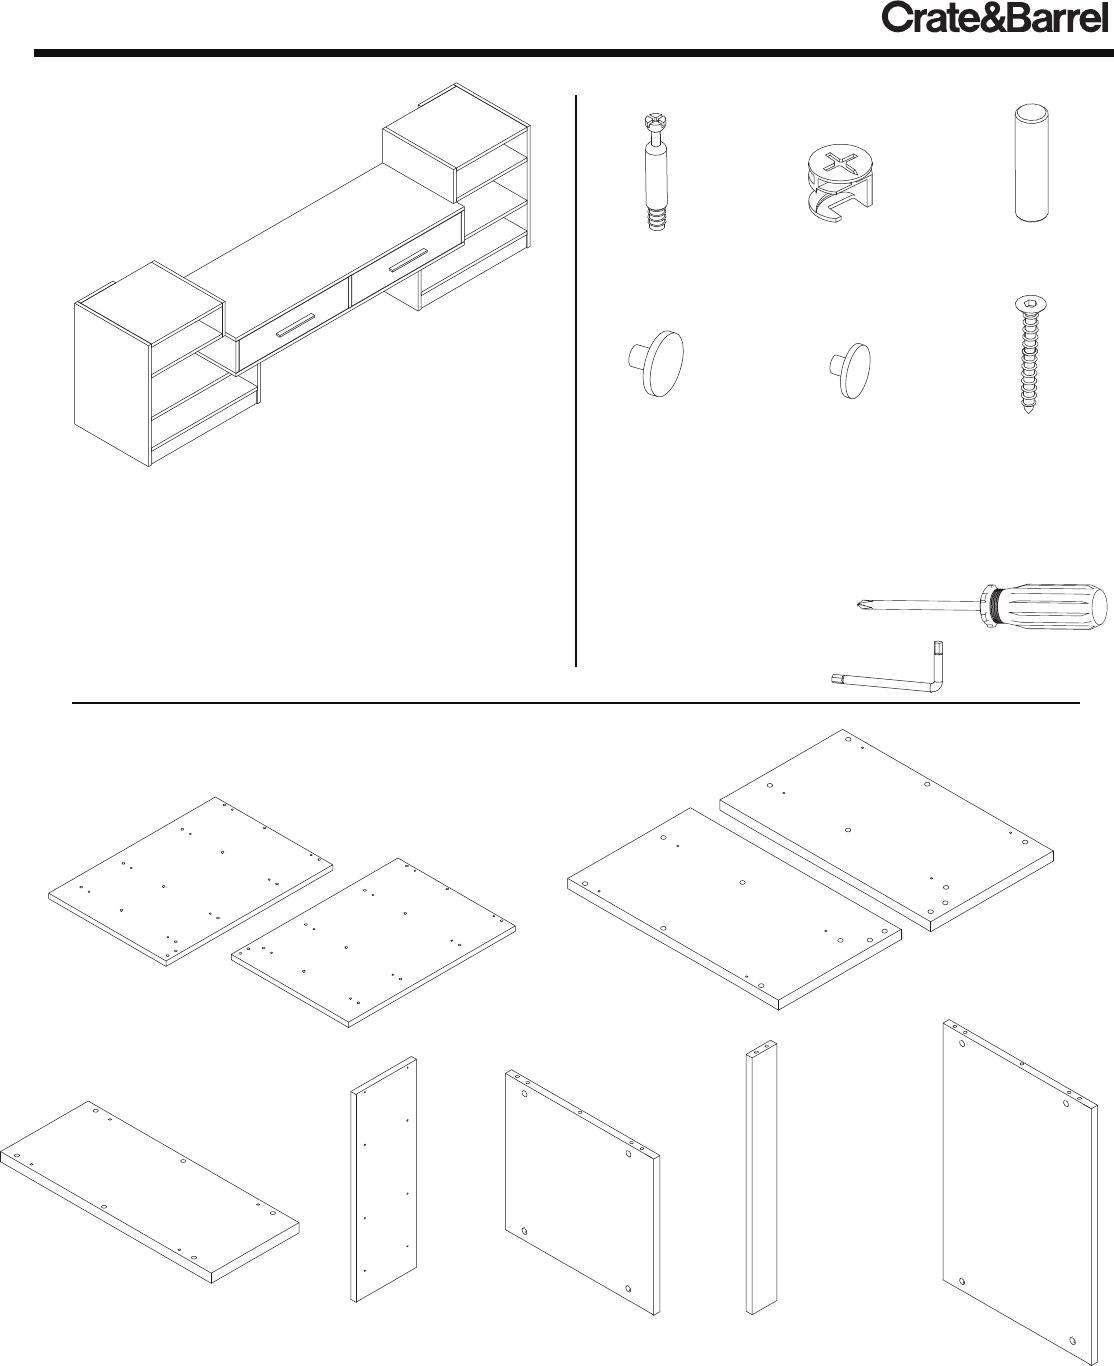 Crate Barrel 837 Puzzle Entertainment Center Assembly